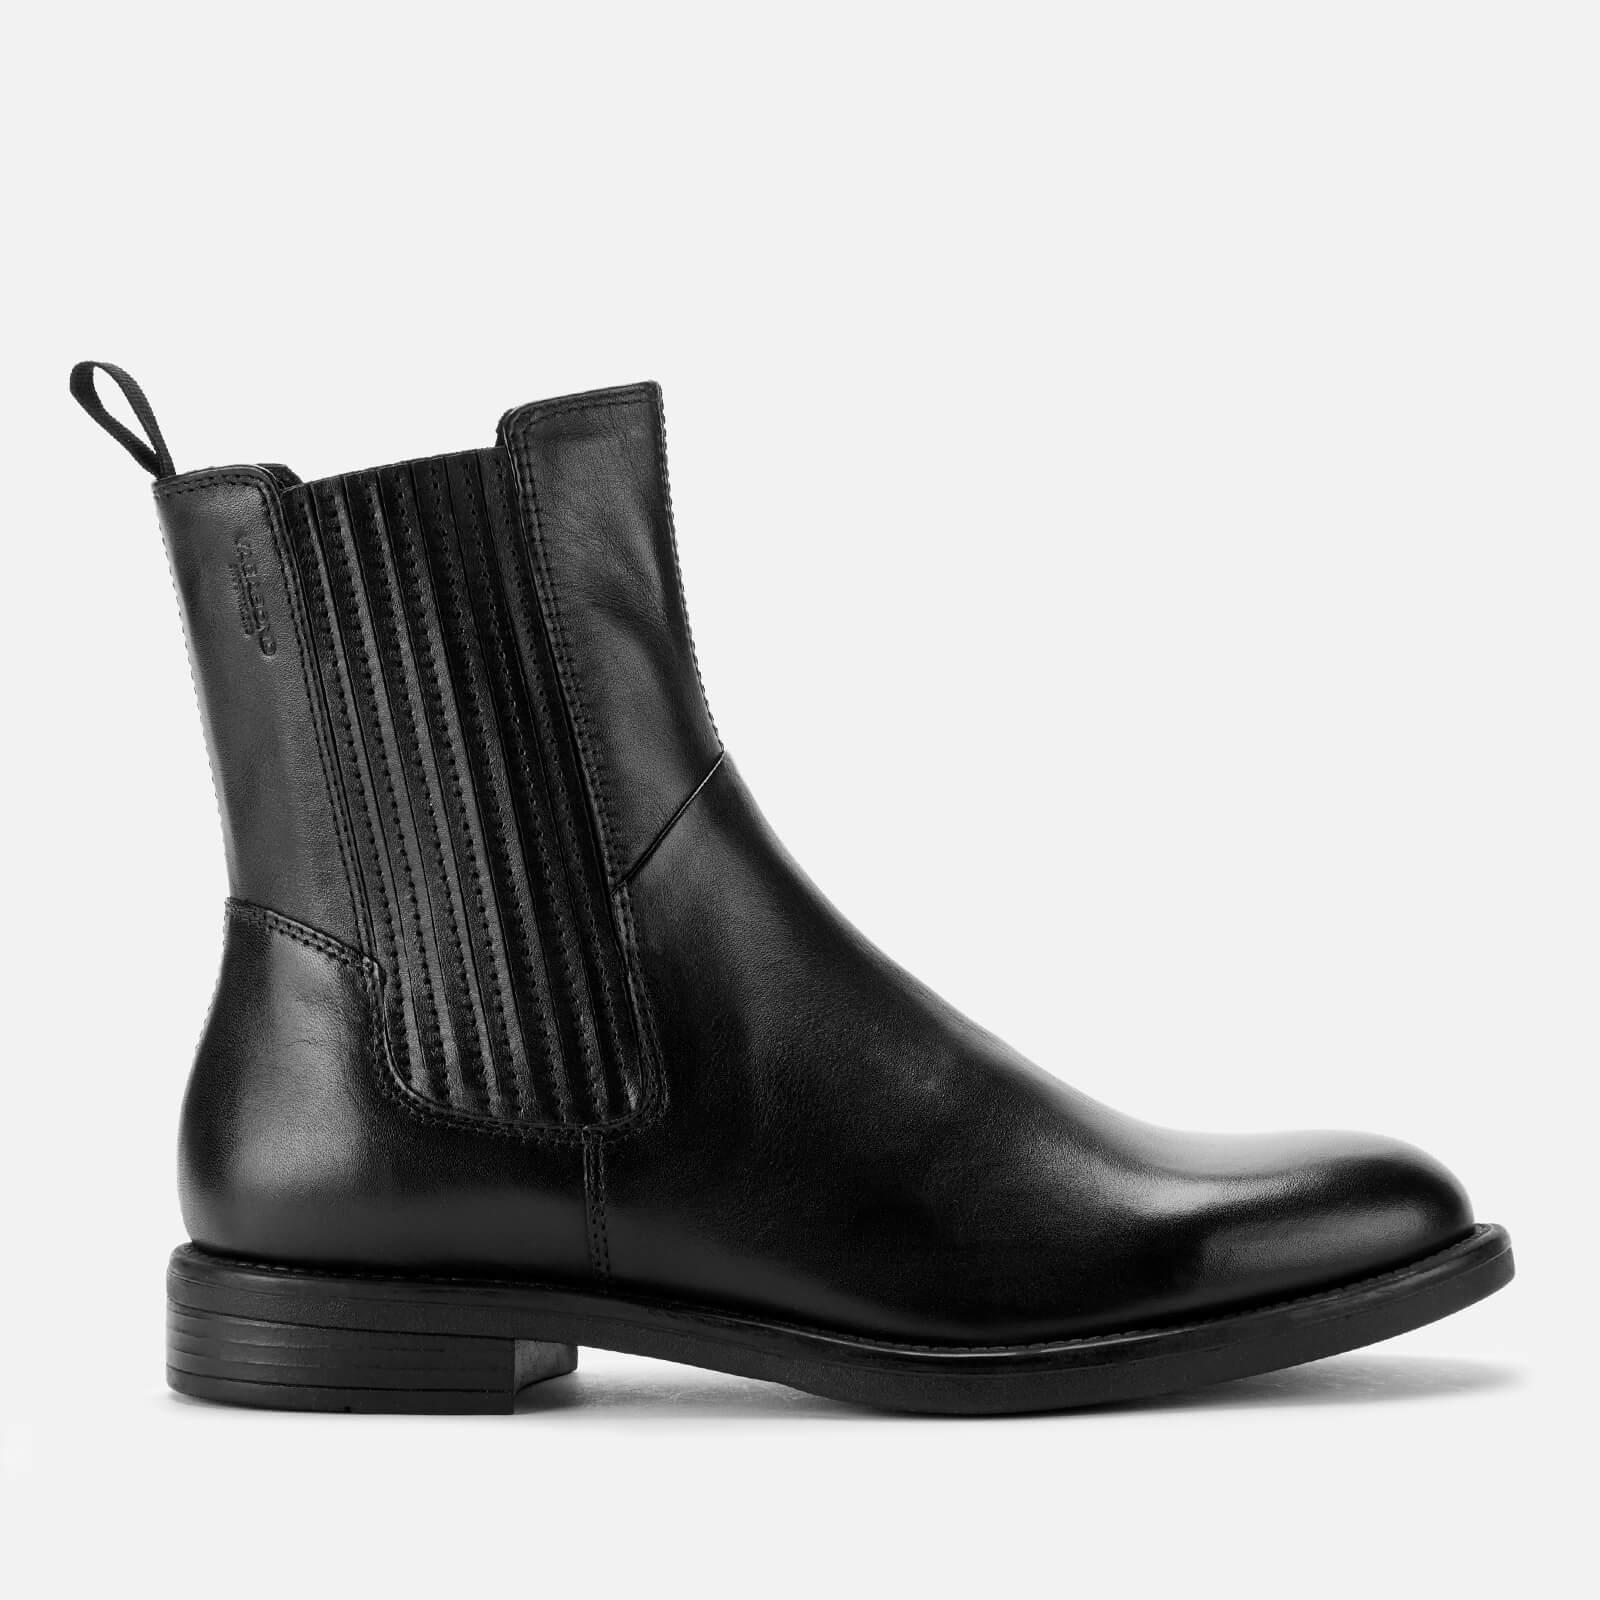 Vagabond Women's Amina Leather Chelsea Boots - Black - UK 3 - Black